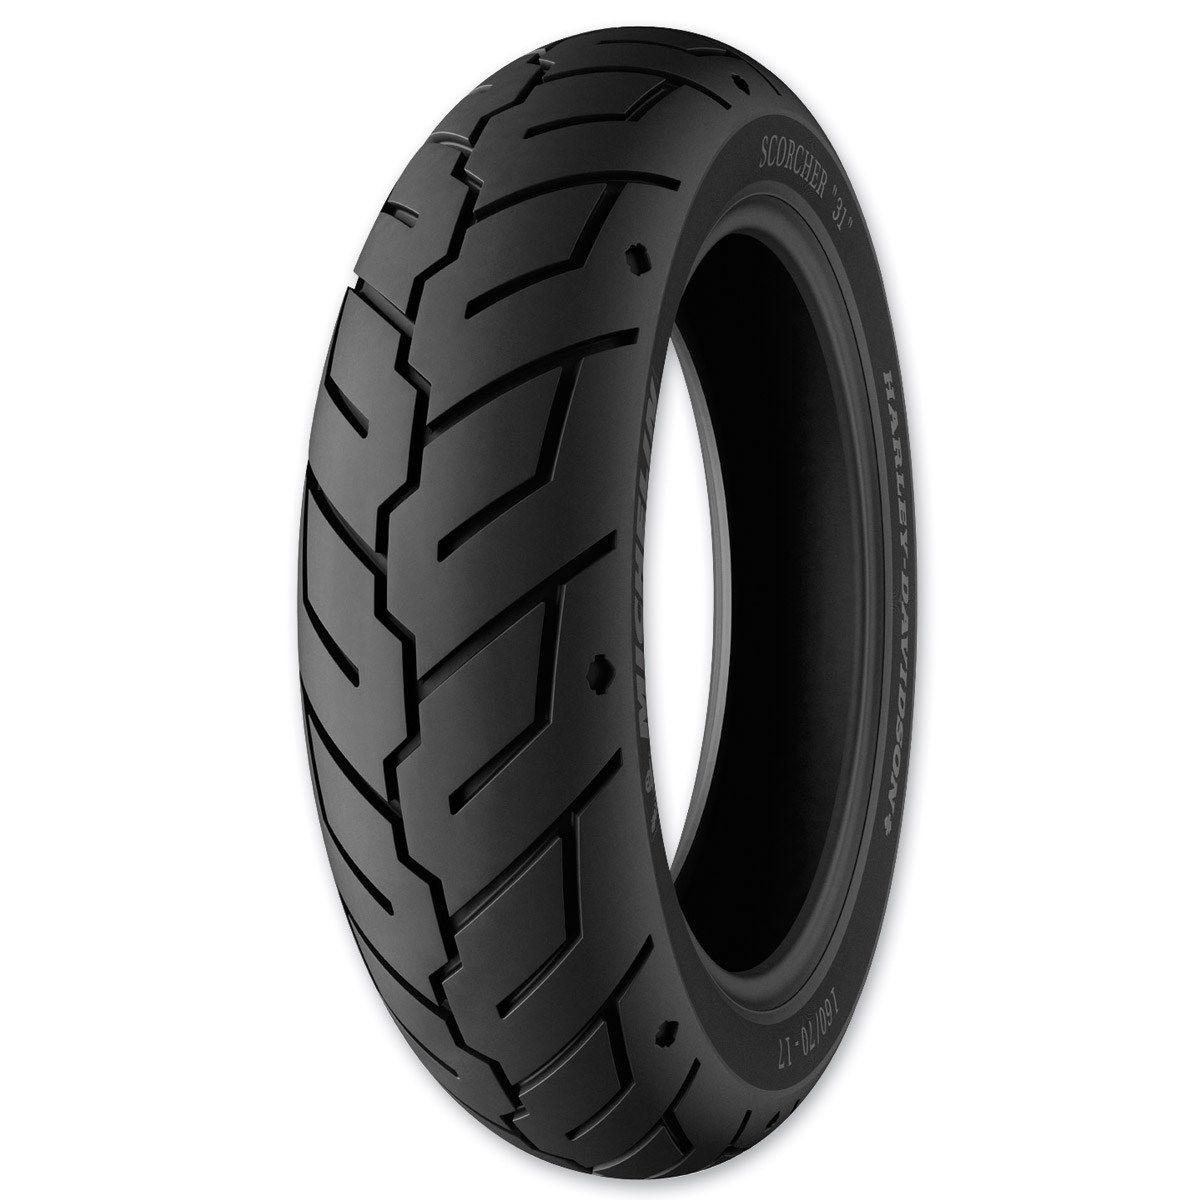 Michelin Scorcher 31 Tires 63478 Motorcycle Tires Harley Davidson Bikes Harley Davidson